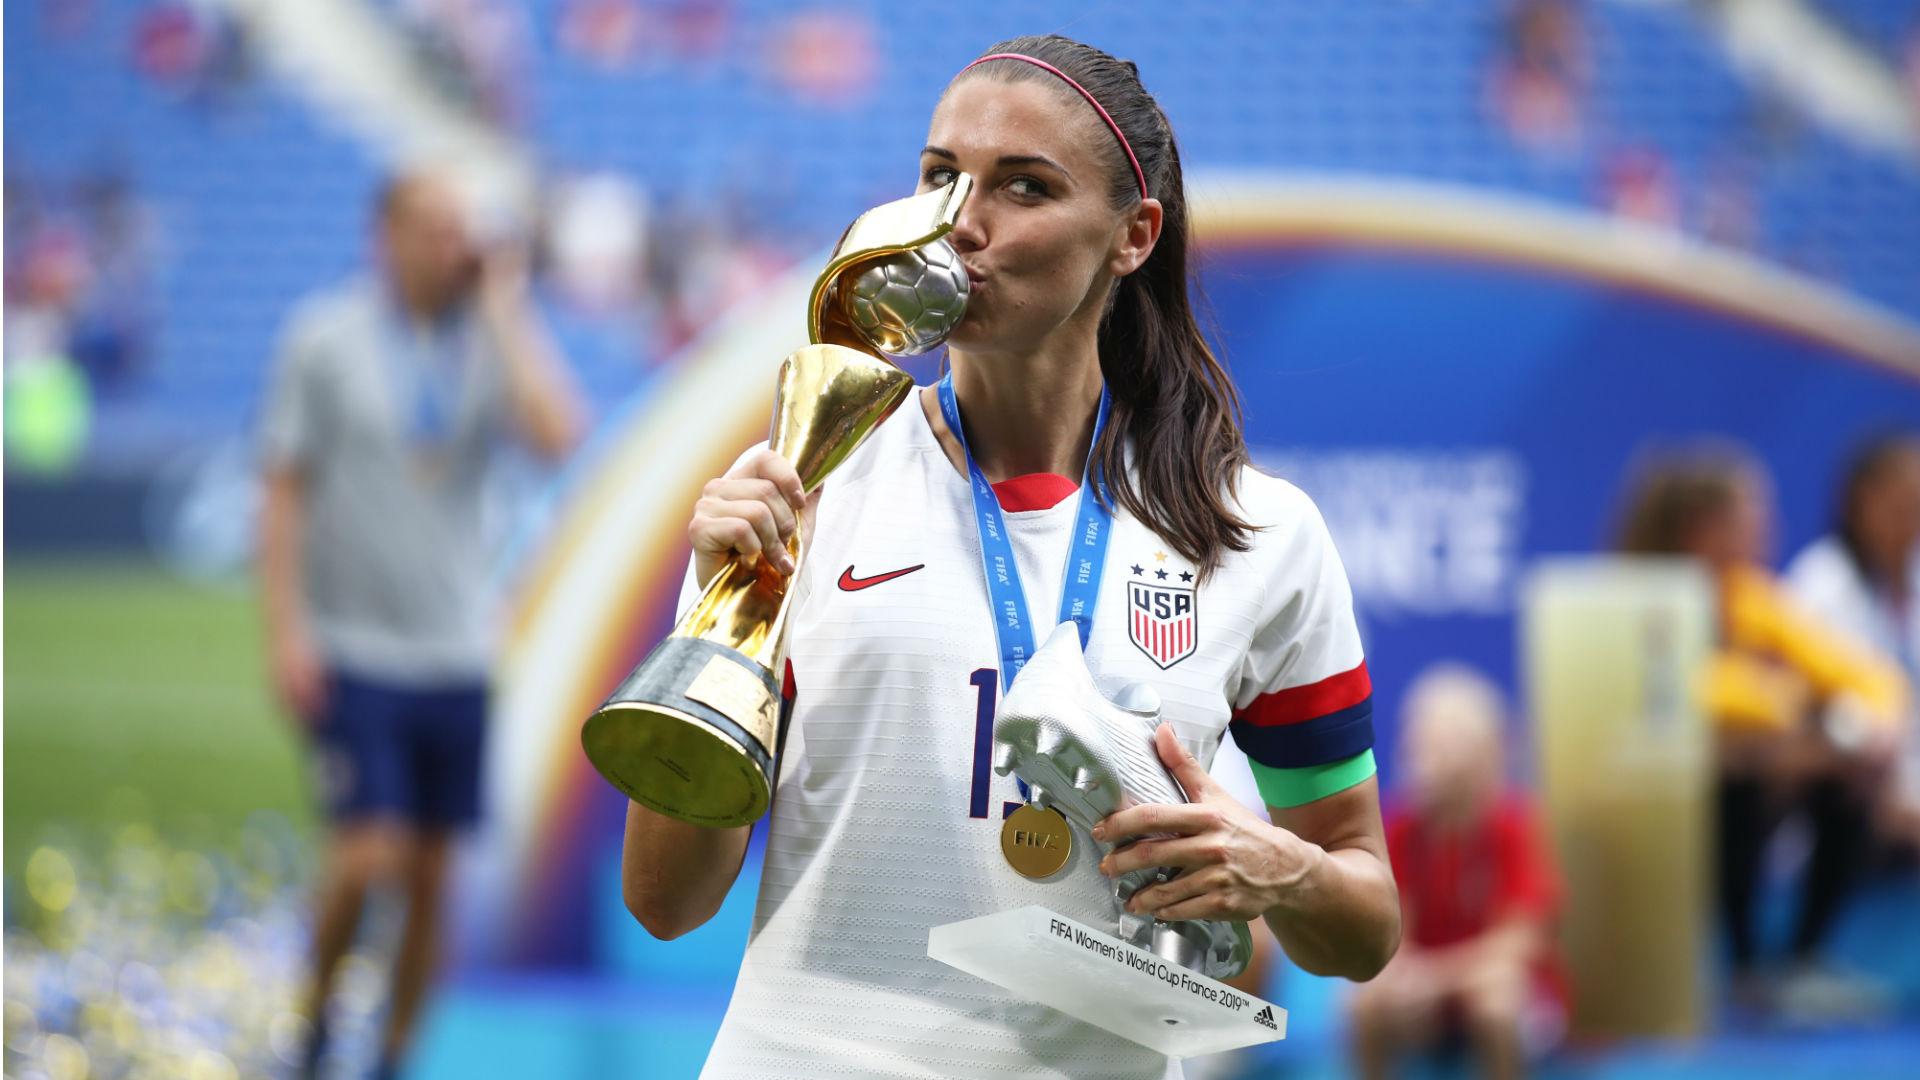 Highest paid female athletes 2019